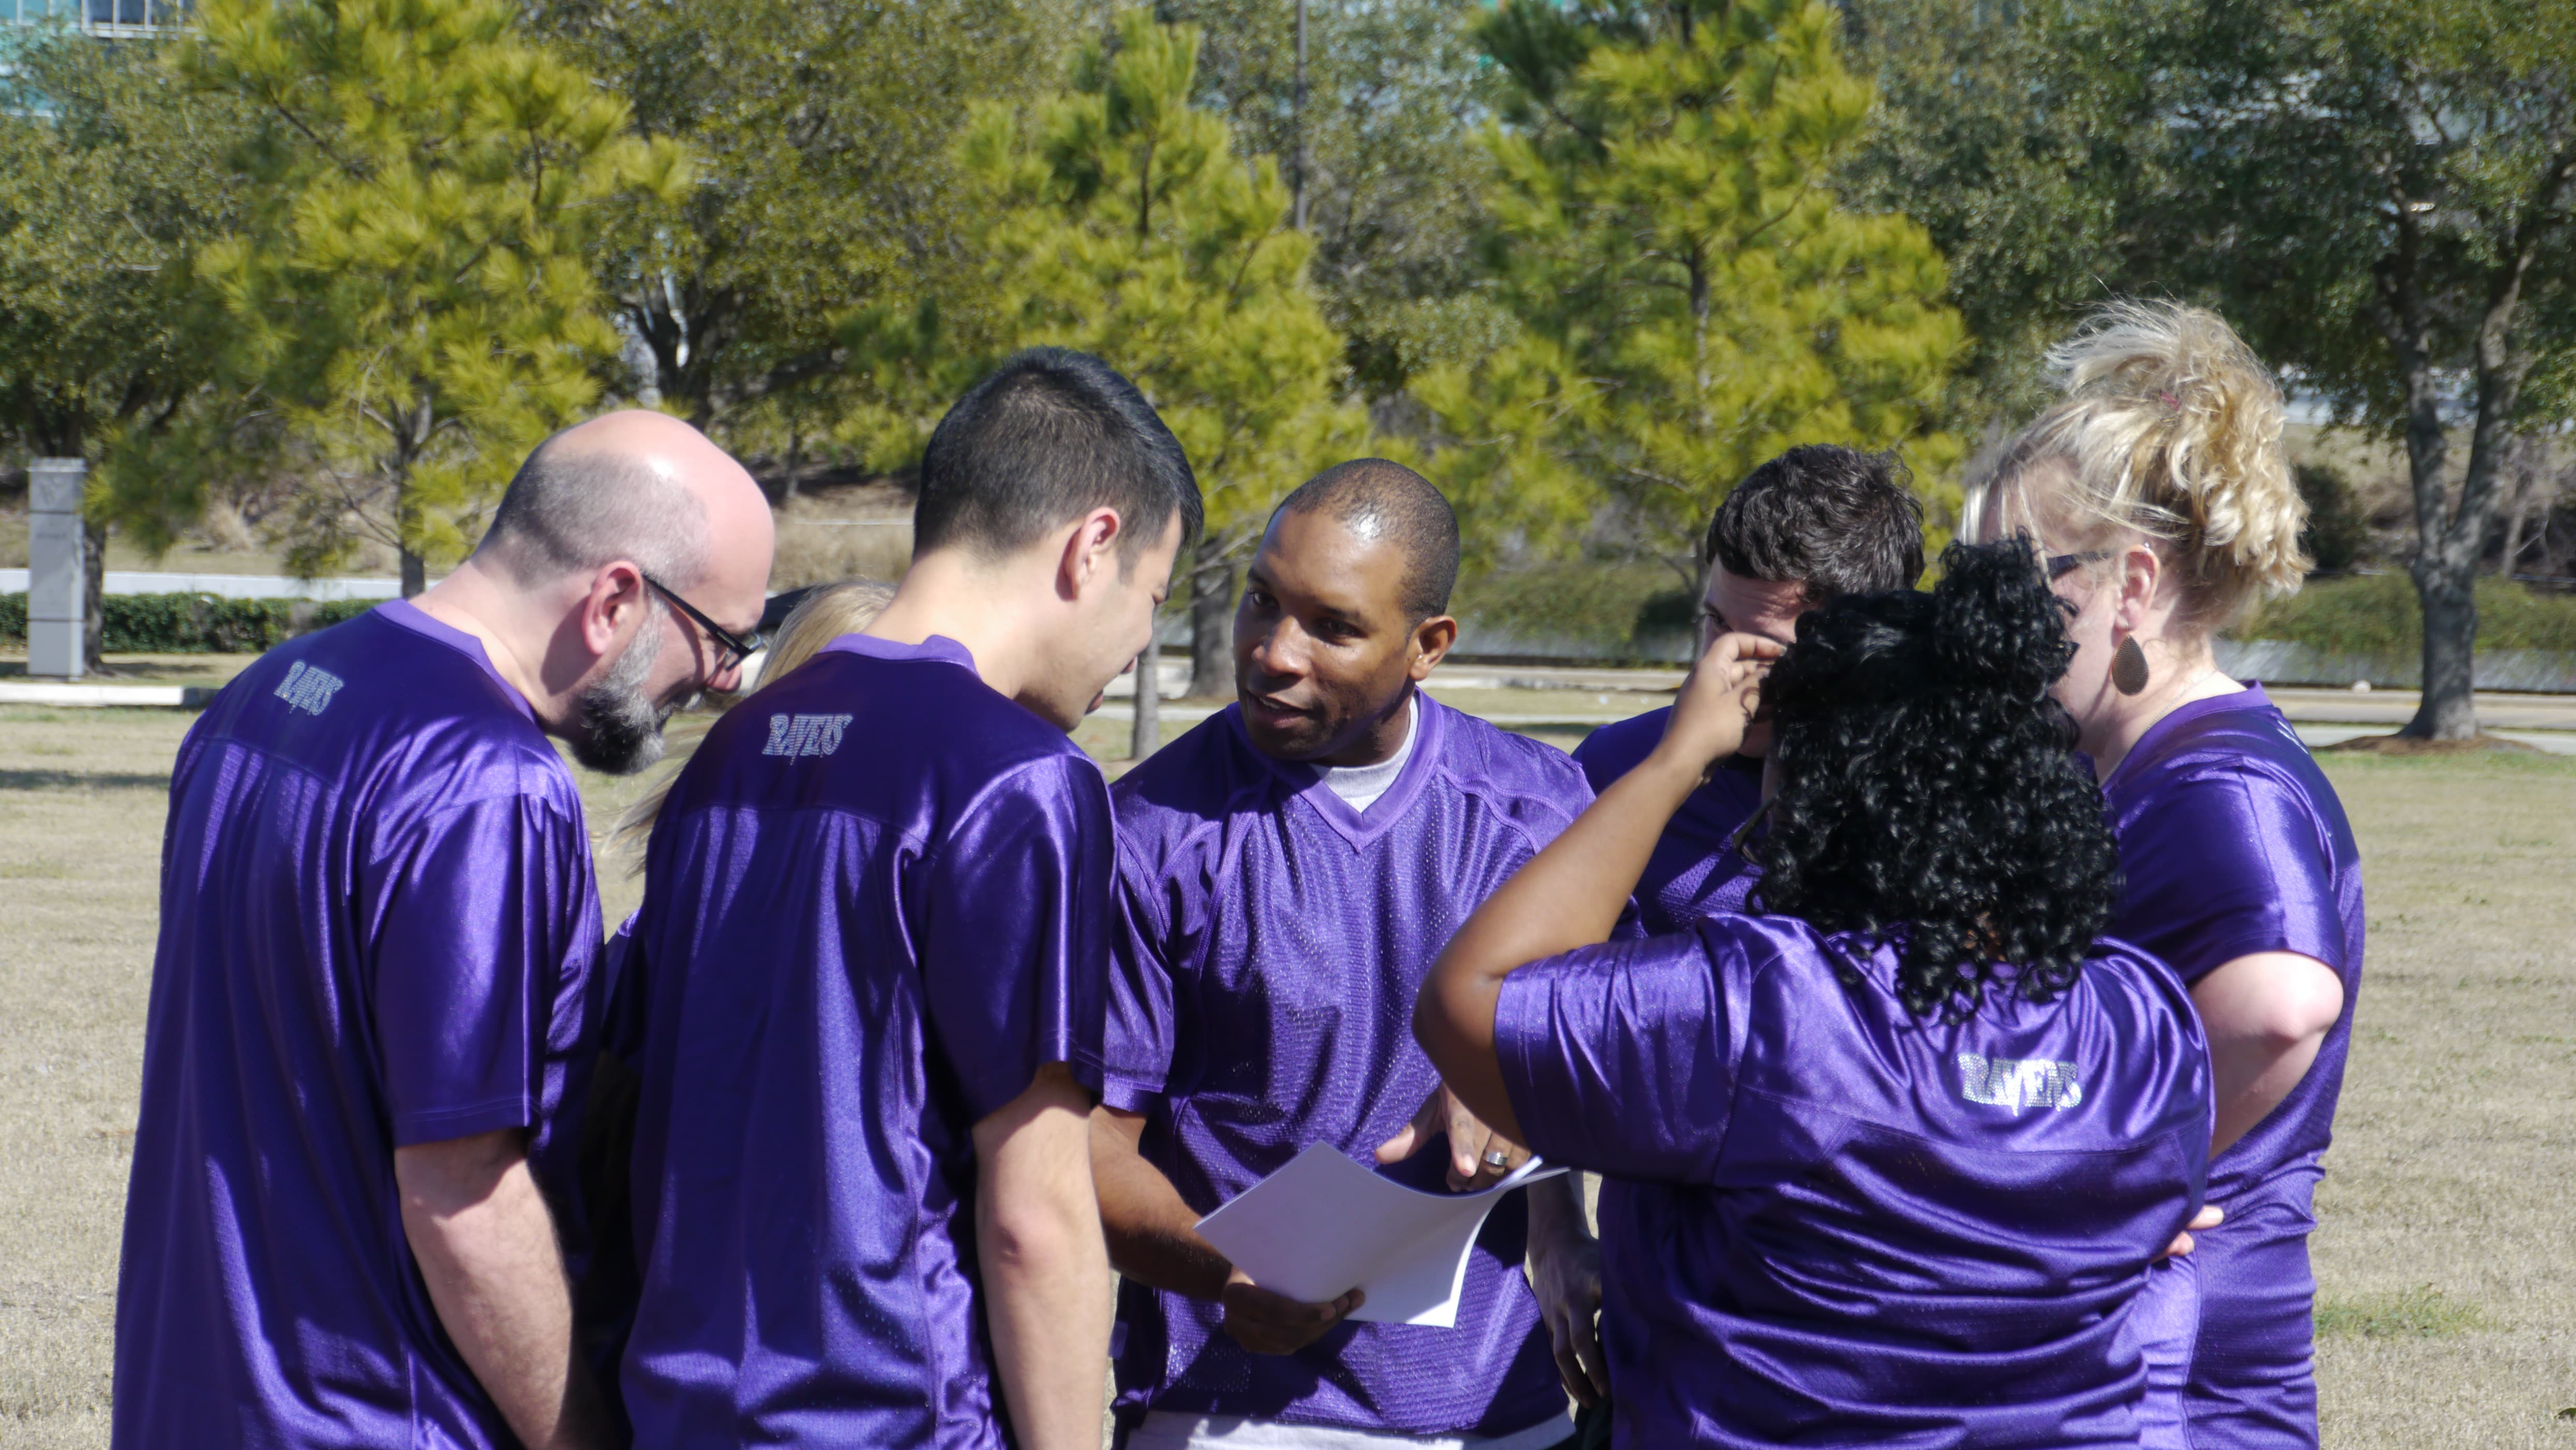 The Ravens gather round to study their plays.